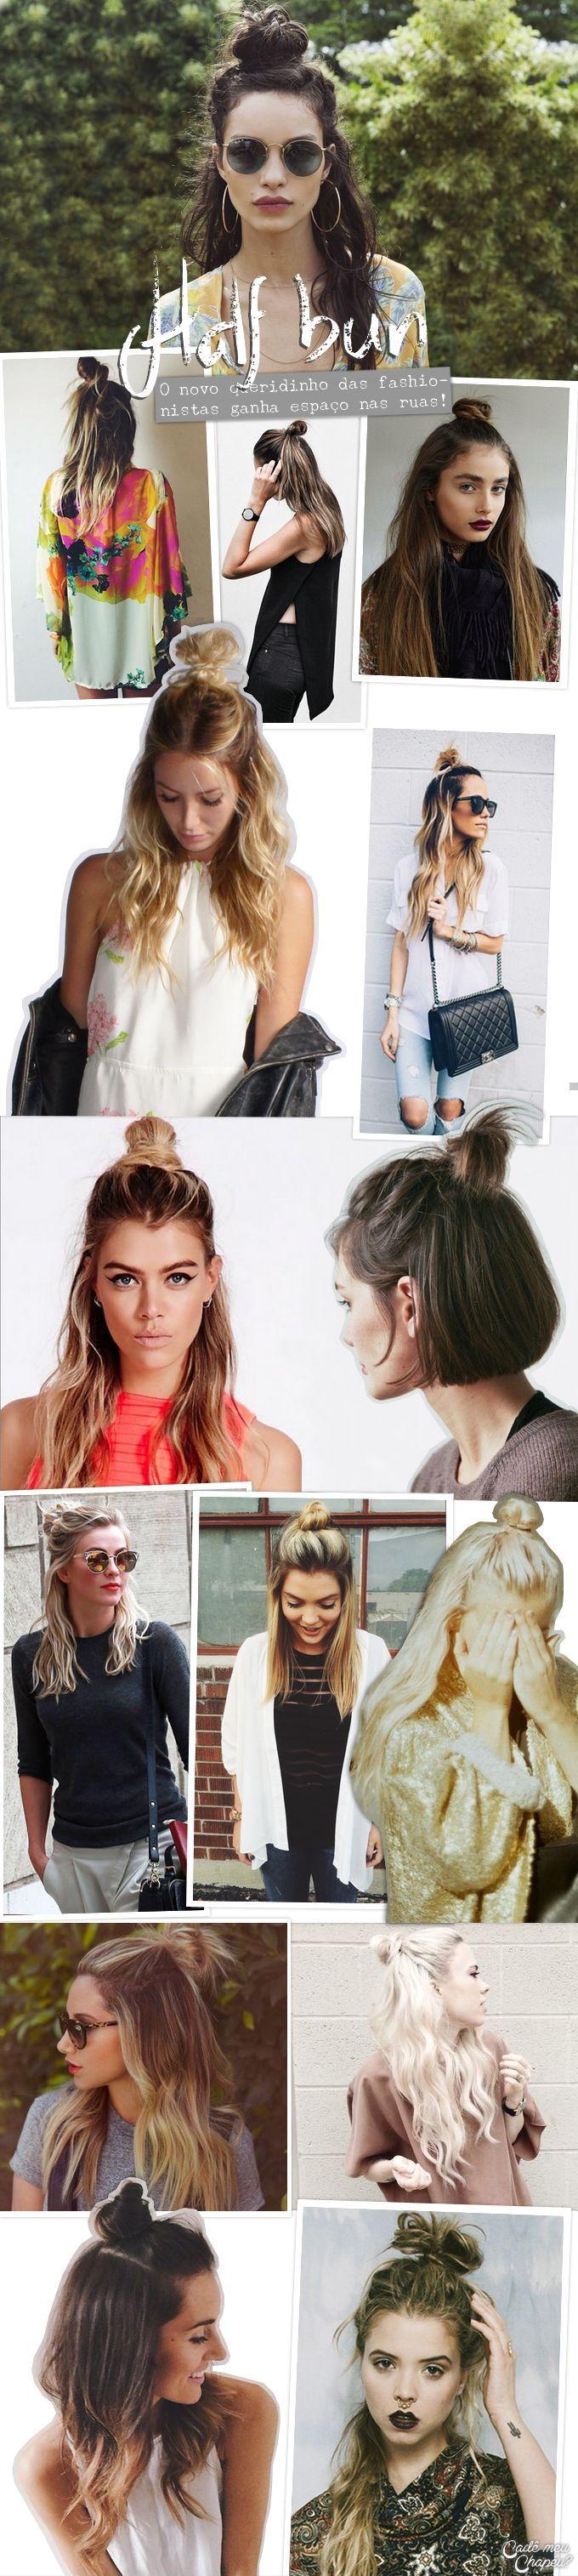 Penteado | Hairdo | Half Bun | Half Up Top Knot | http://cademeuchapeu.com